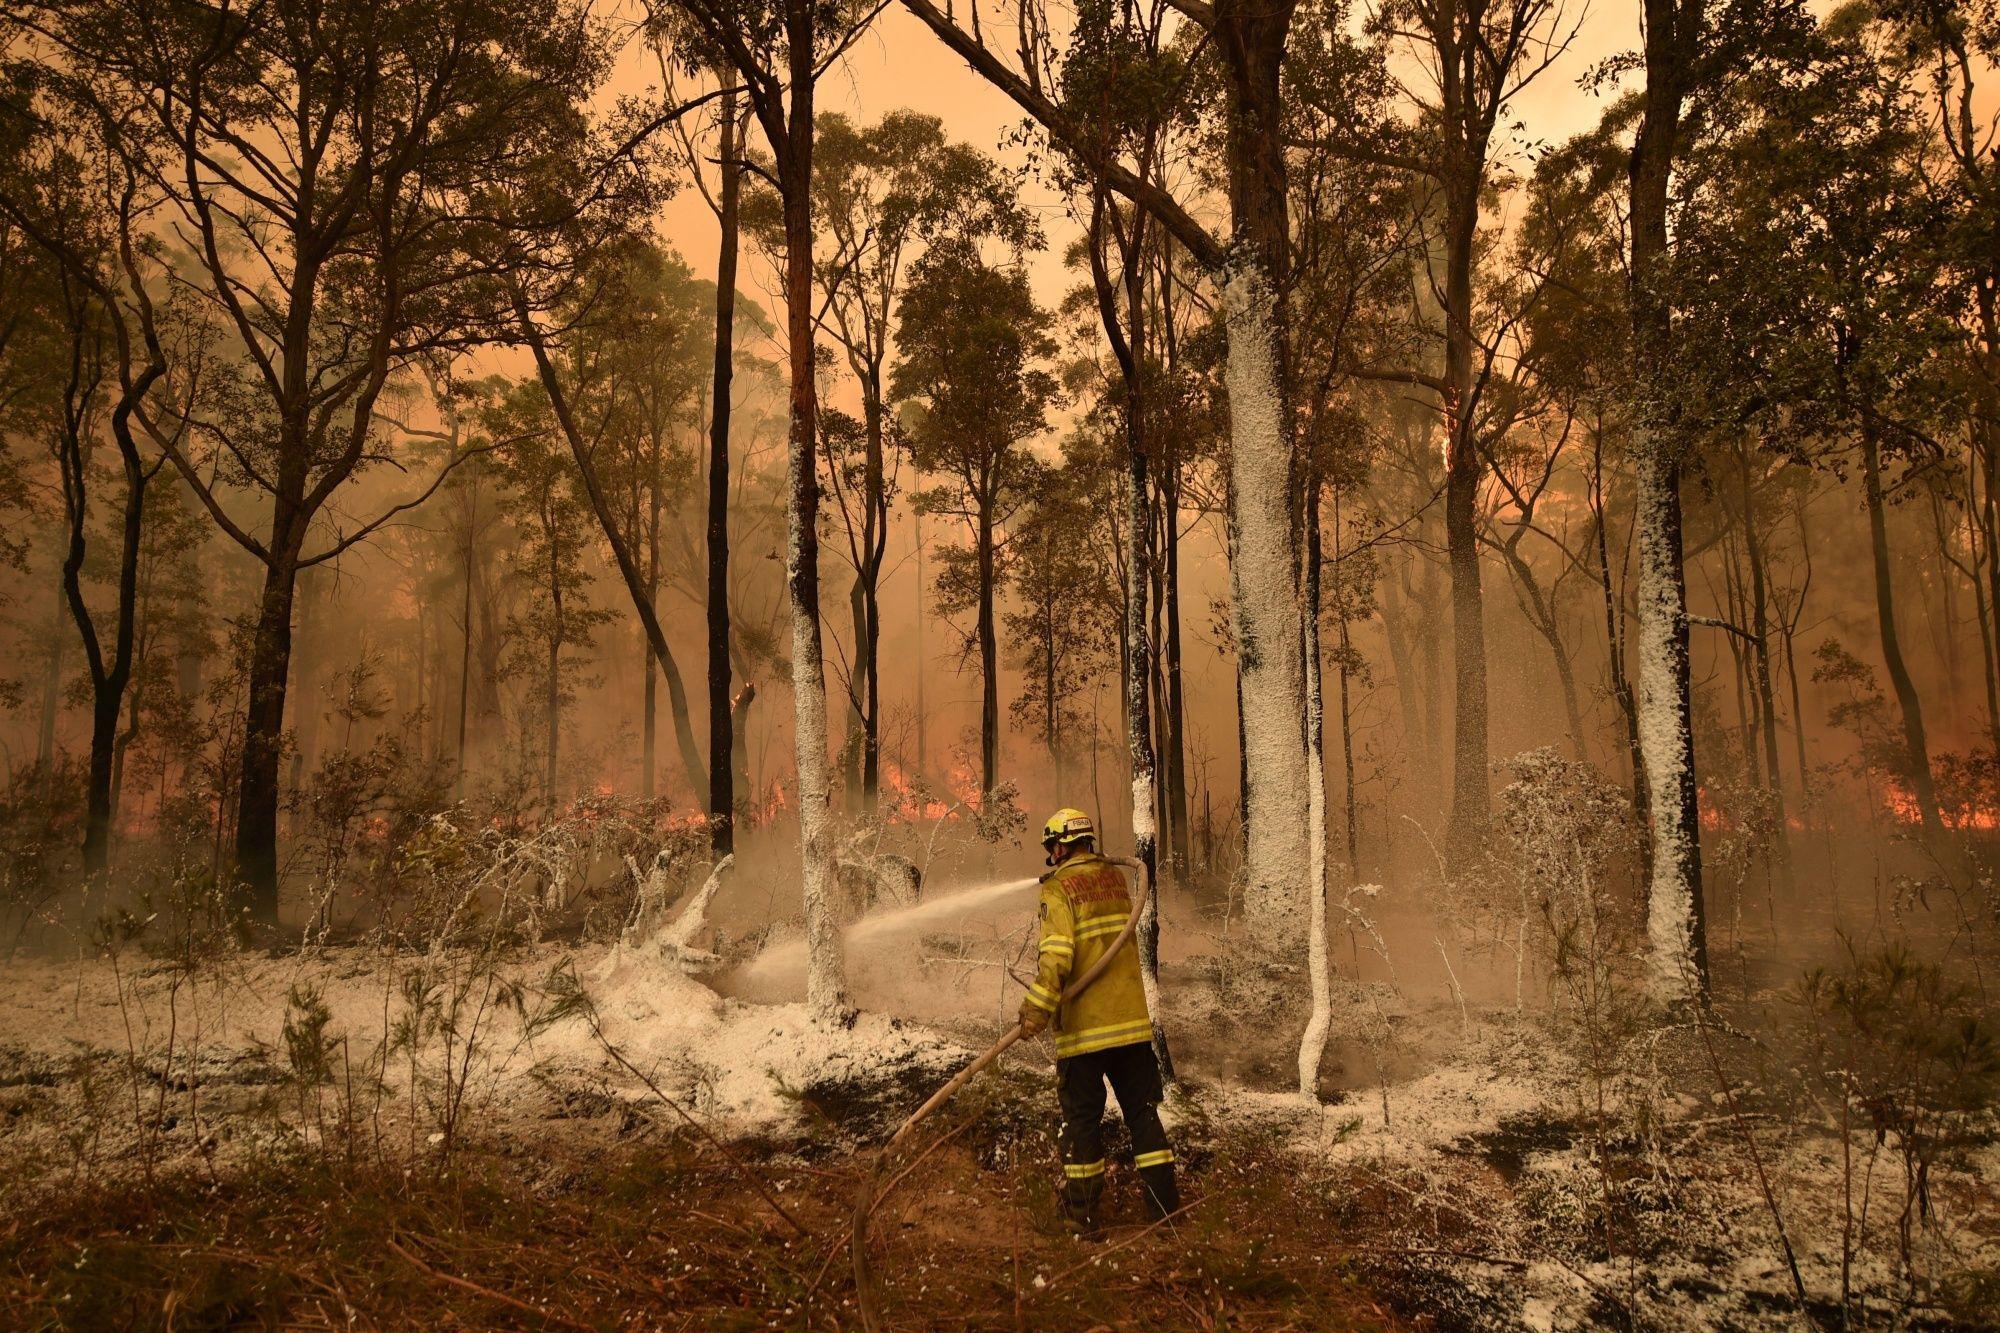 Australia Wildfires Trigger Exodus as Navy Joins Rescue Effort